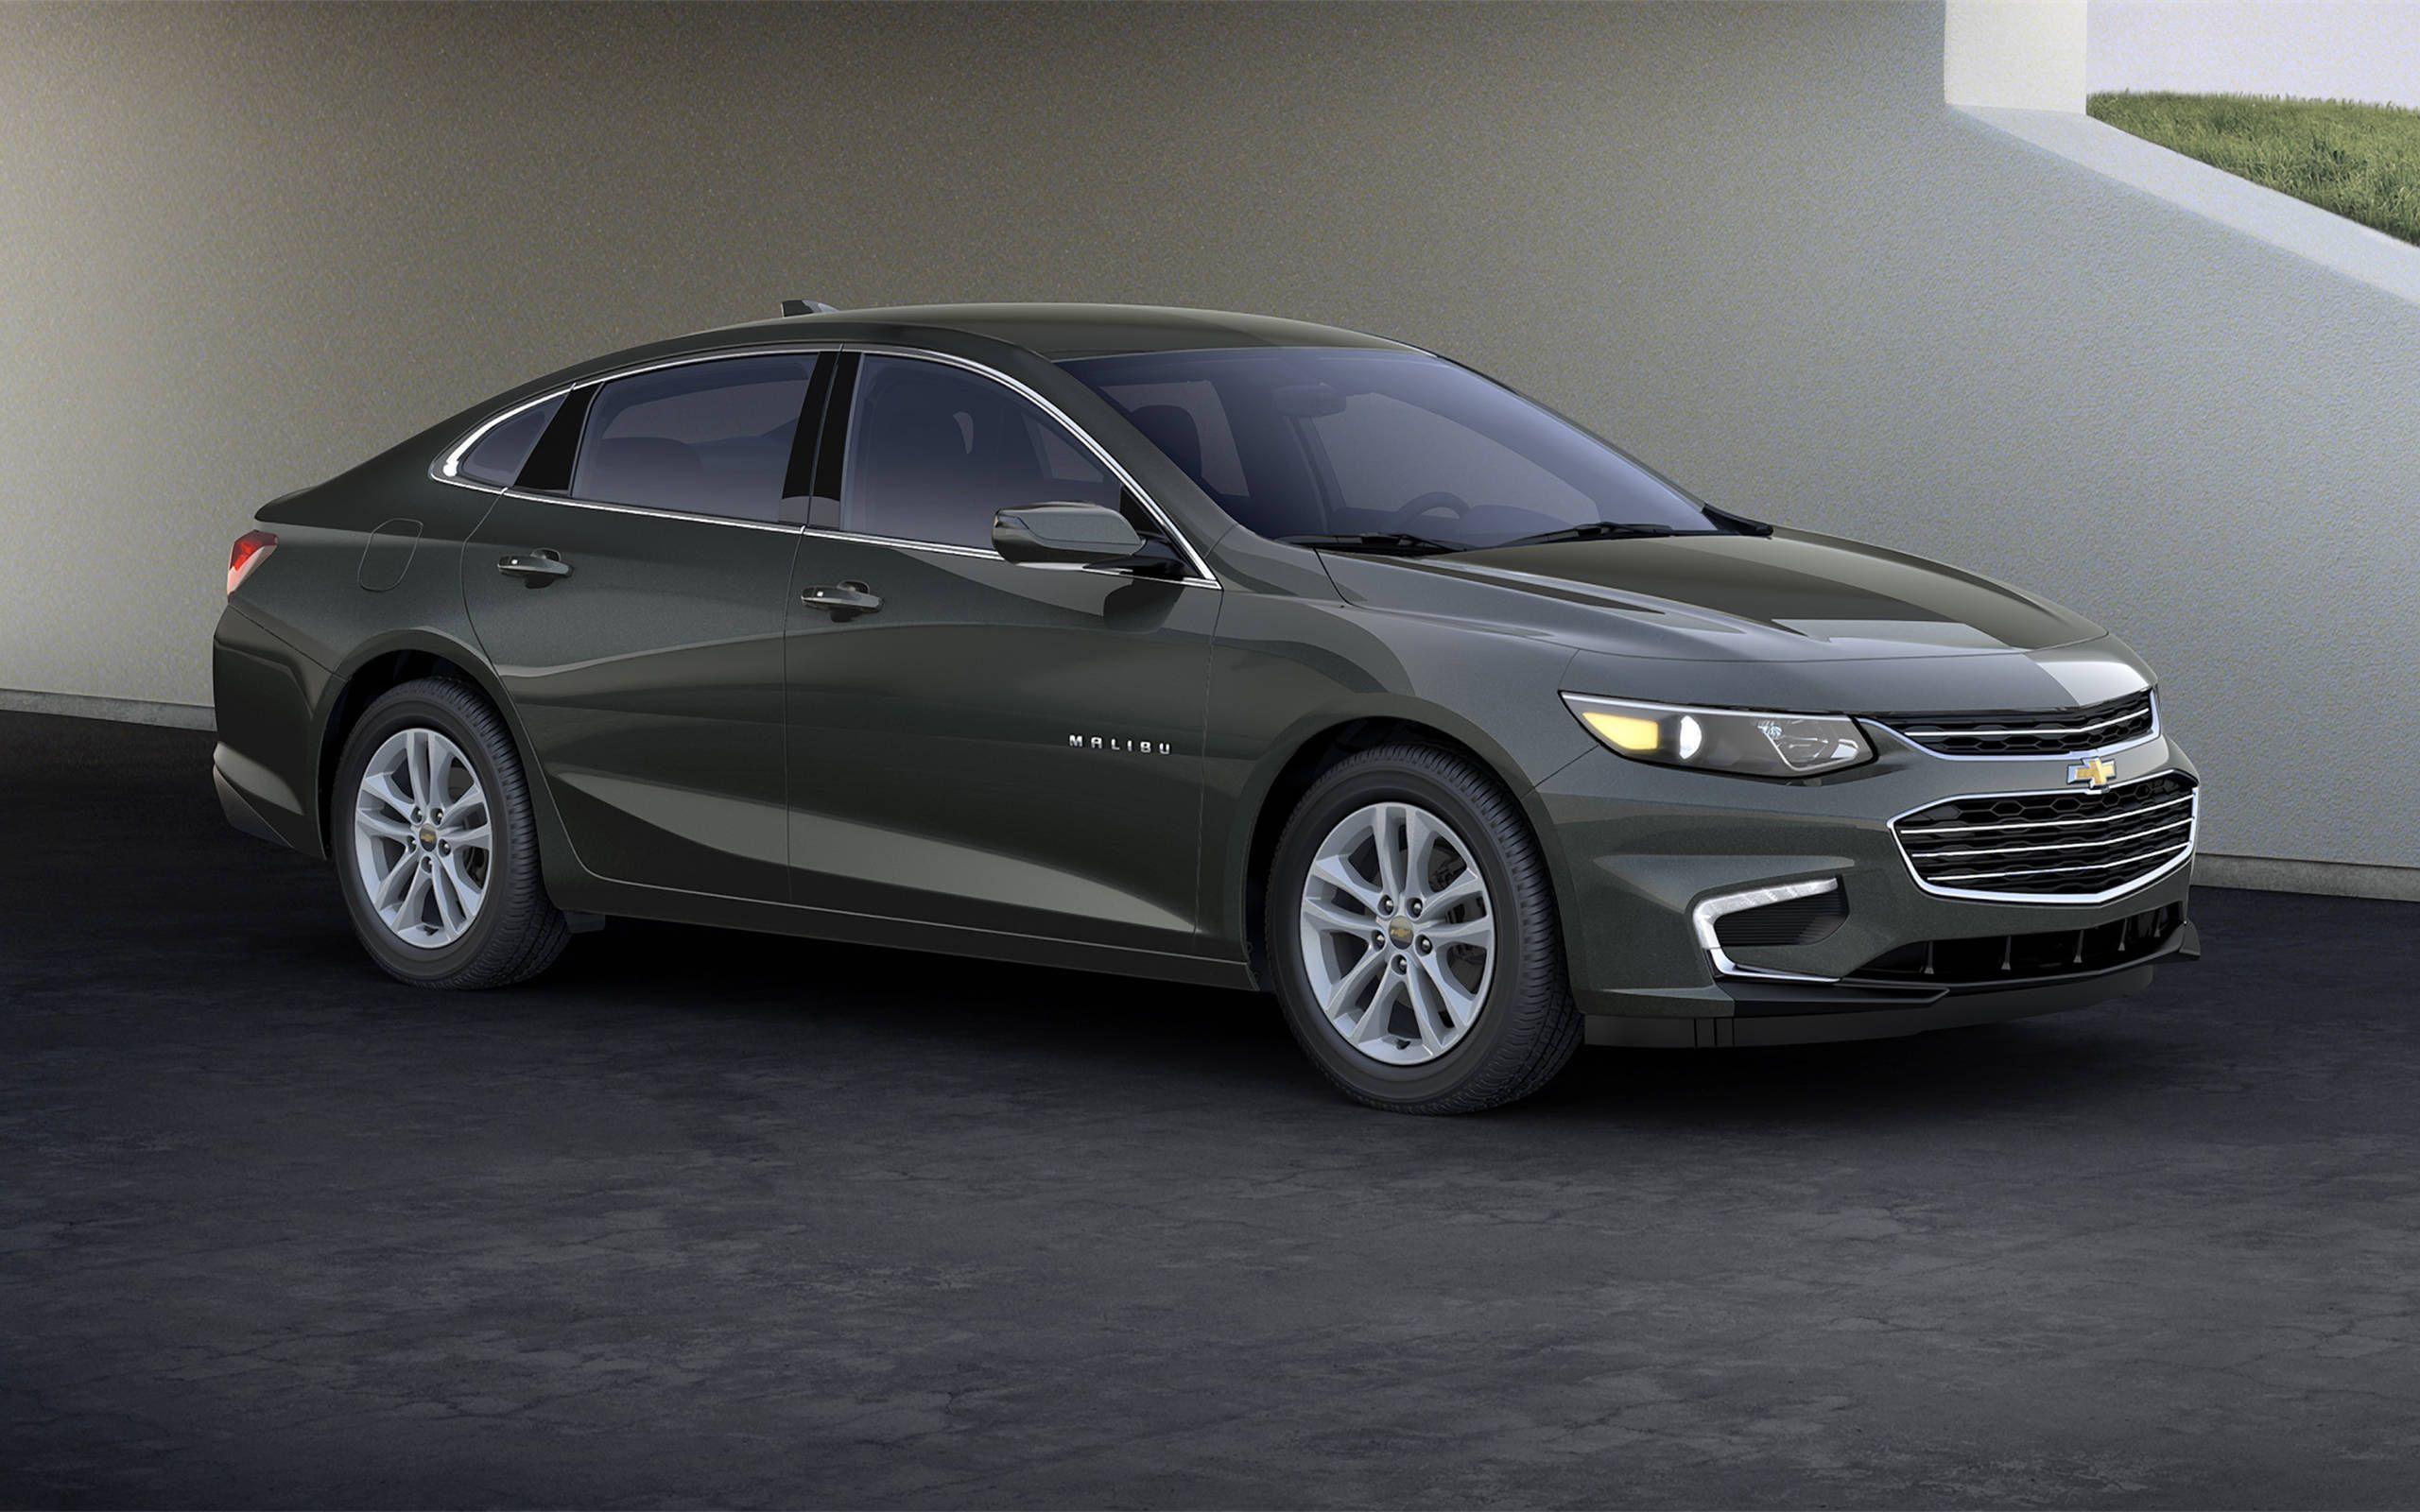 2016 Chevrolet Malibu Lt Review New